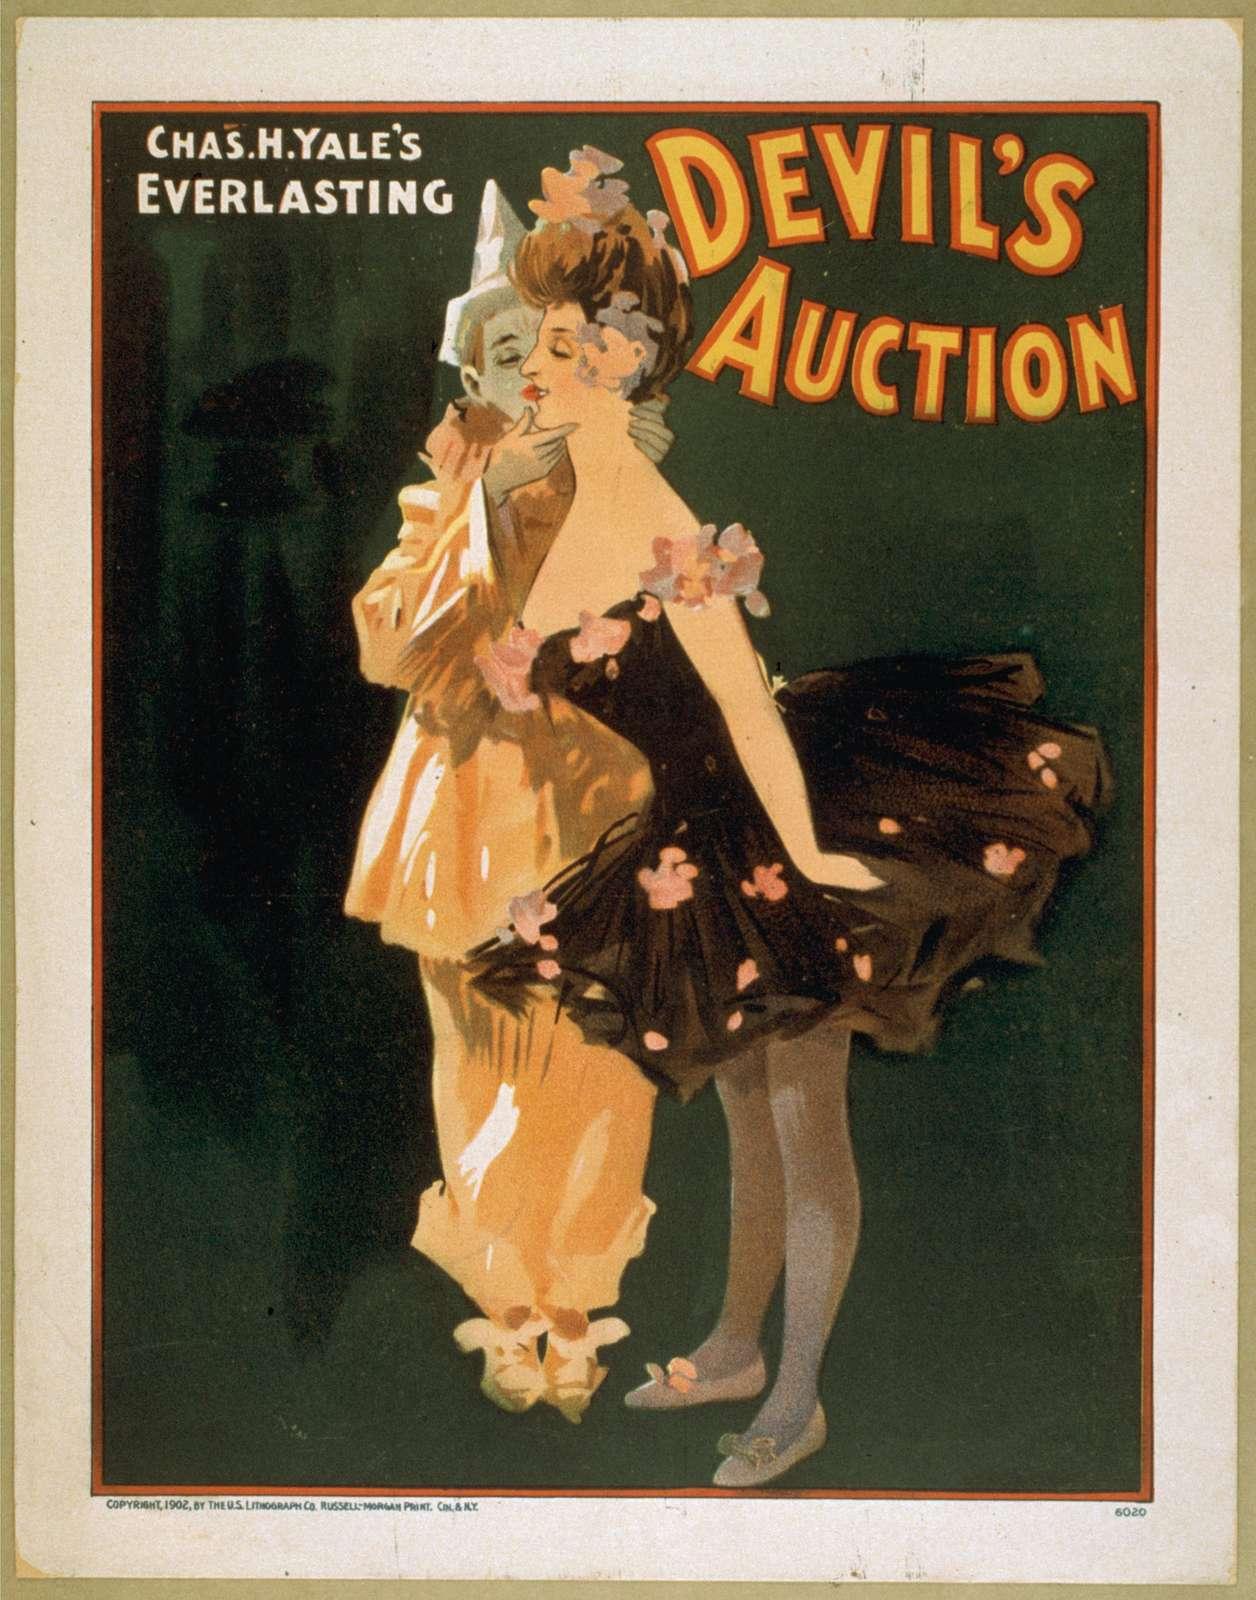 Chas. H. Yale's everlasting Devil's auction